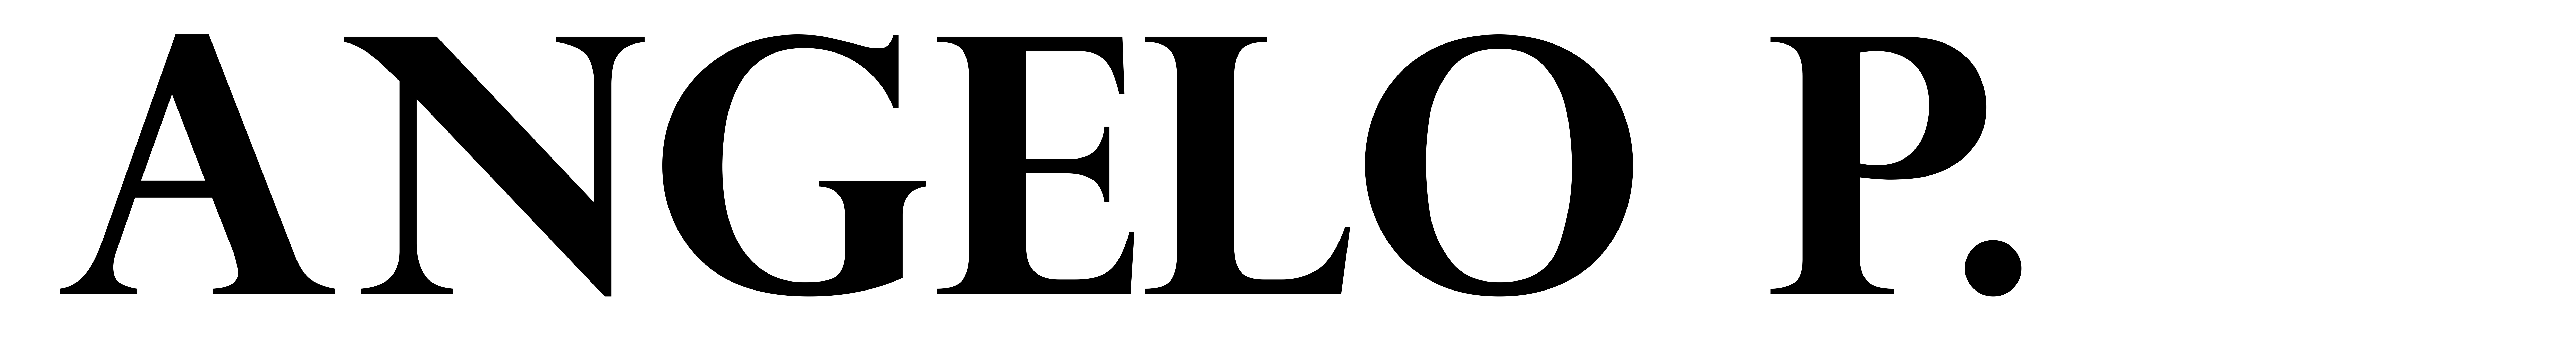 angelopantazis